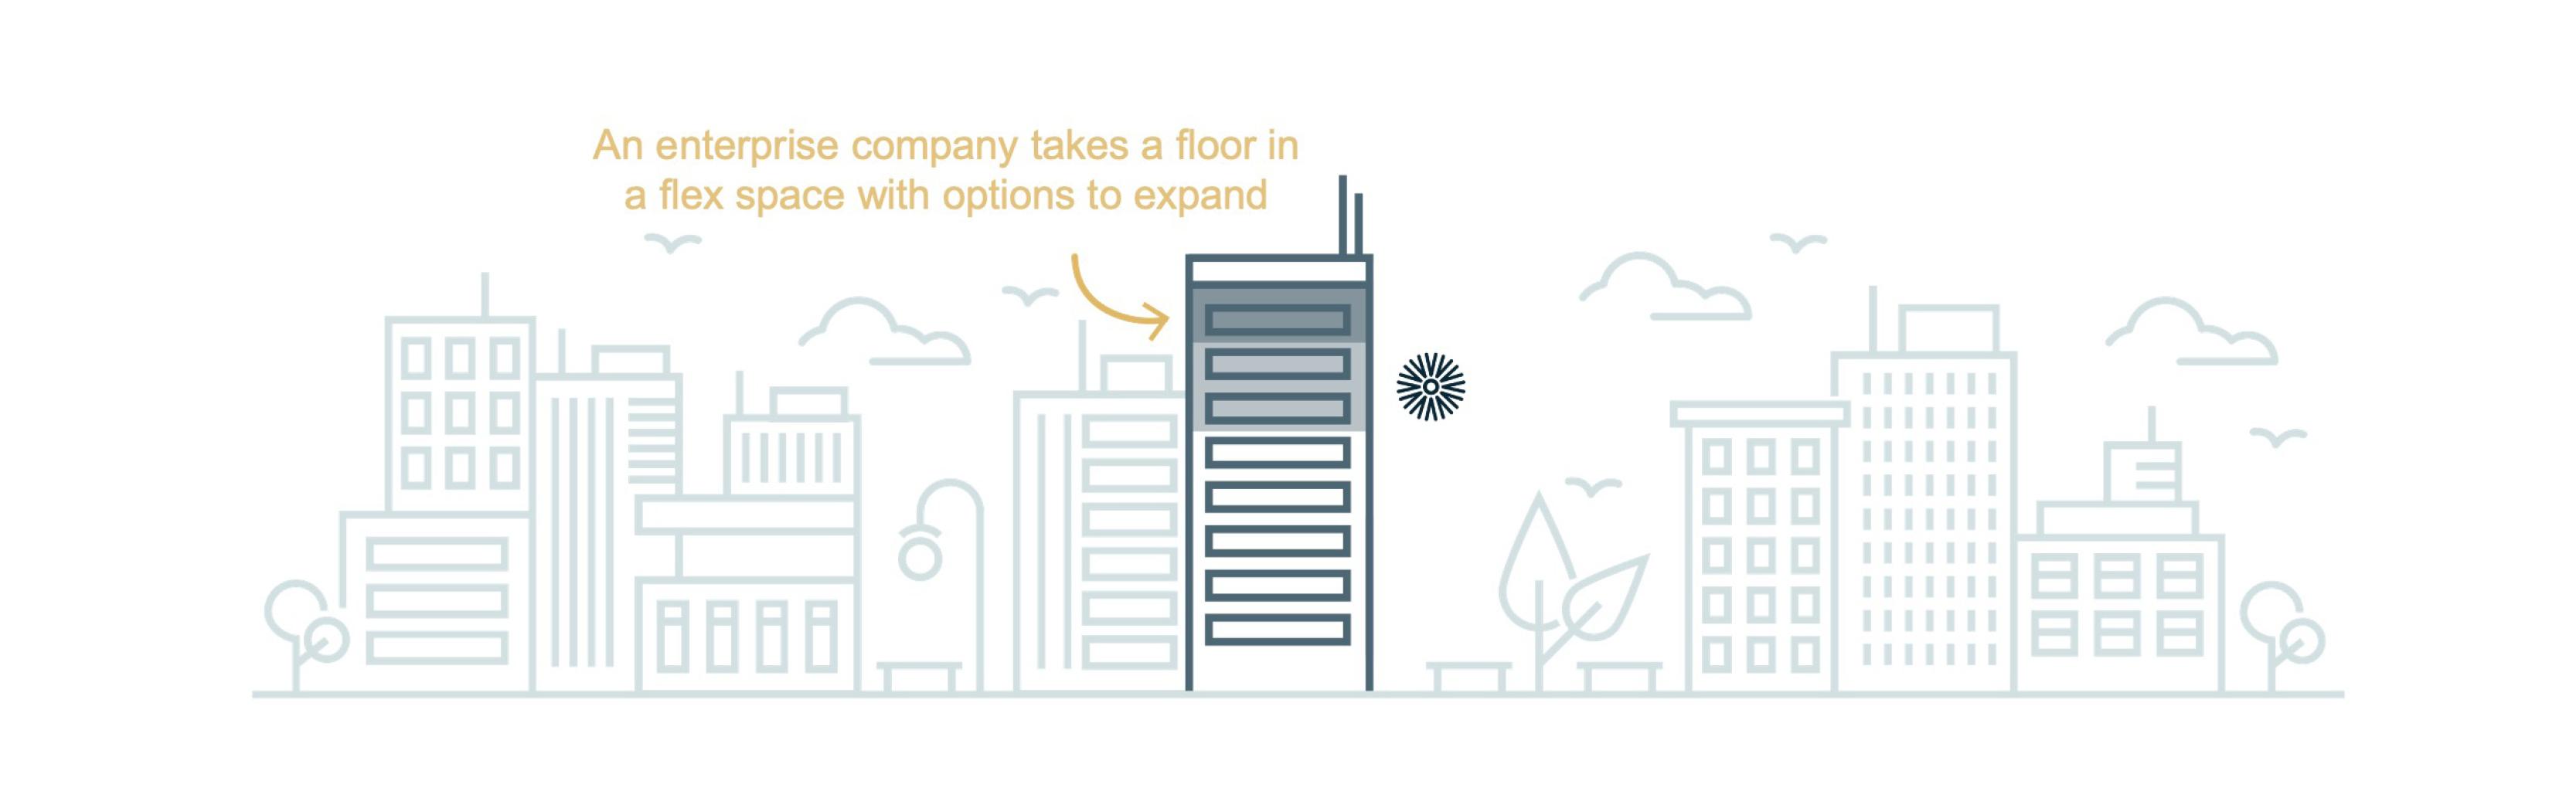 how-enterprise-companies-use-flex-space-headcount-uncertainty